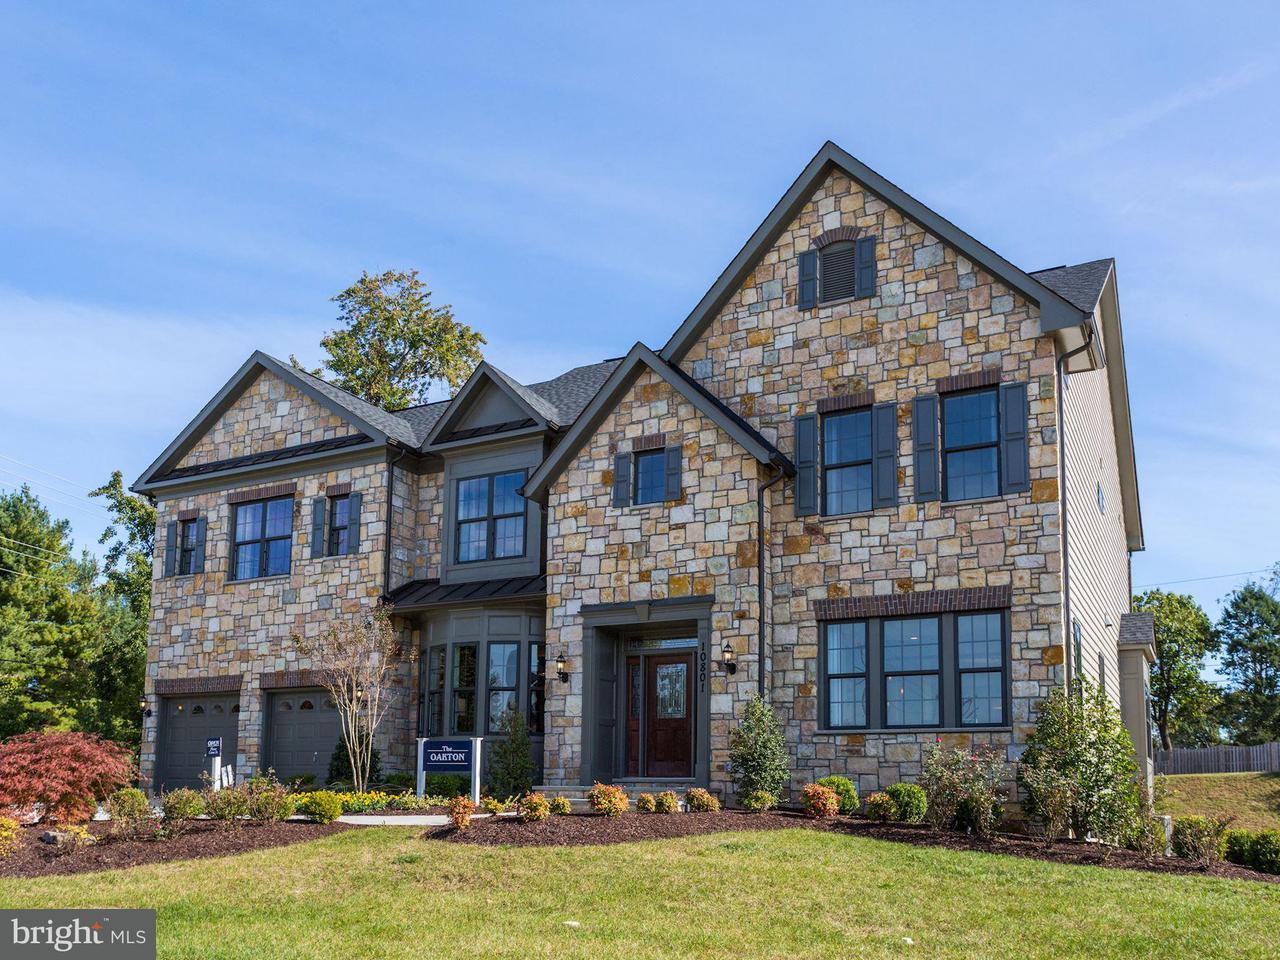 独户住宅 为 销售 在 10801 Rockland Drive 10801 Rockland Drive Laurel, 马里兰州 20723 美国